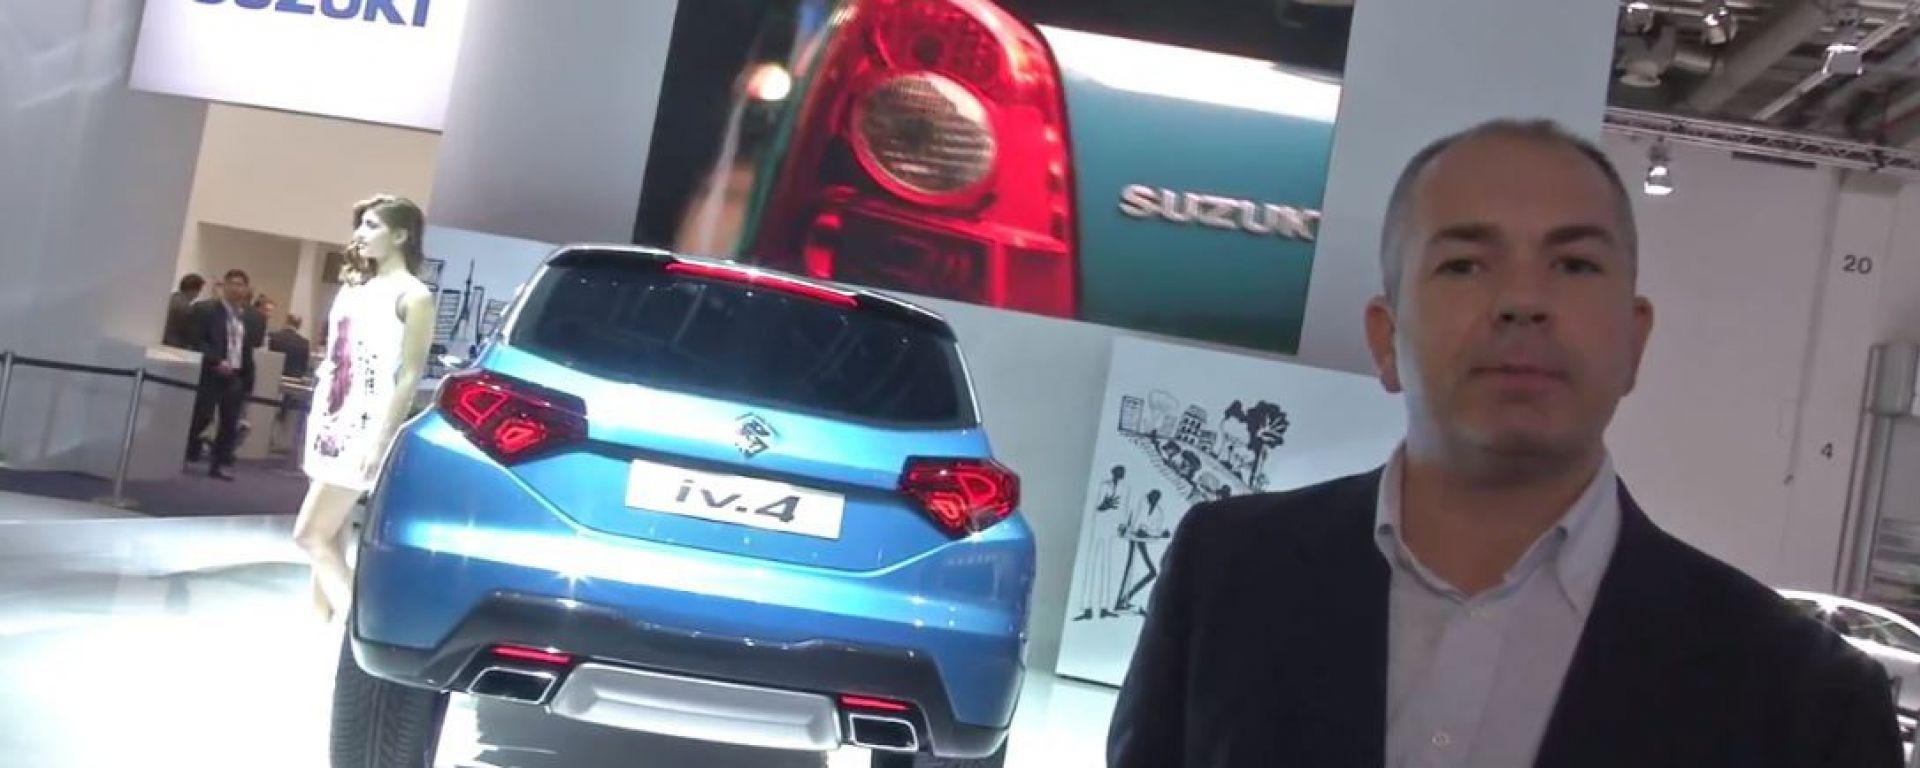 Francoforte 2013, lo stand Suzuki